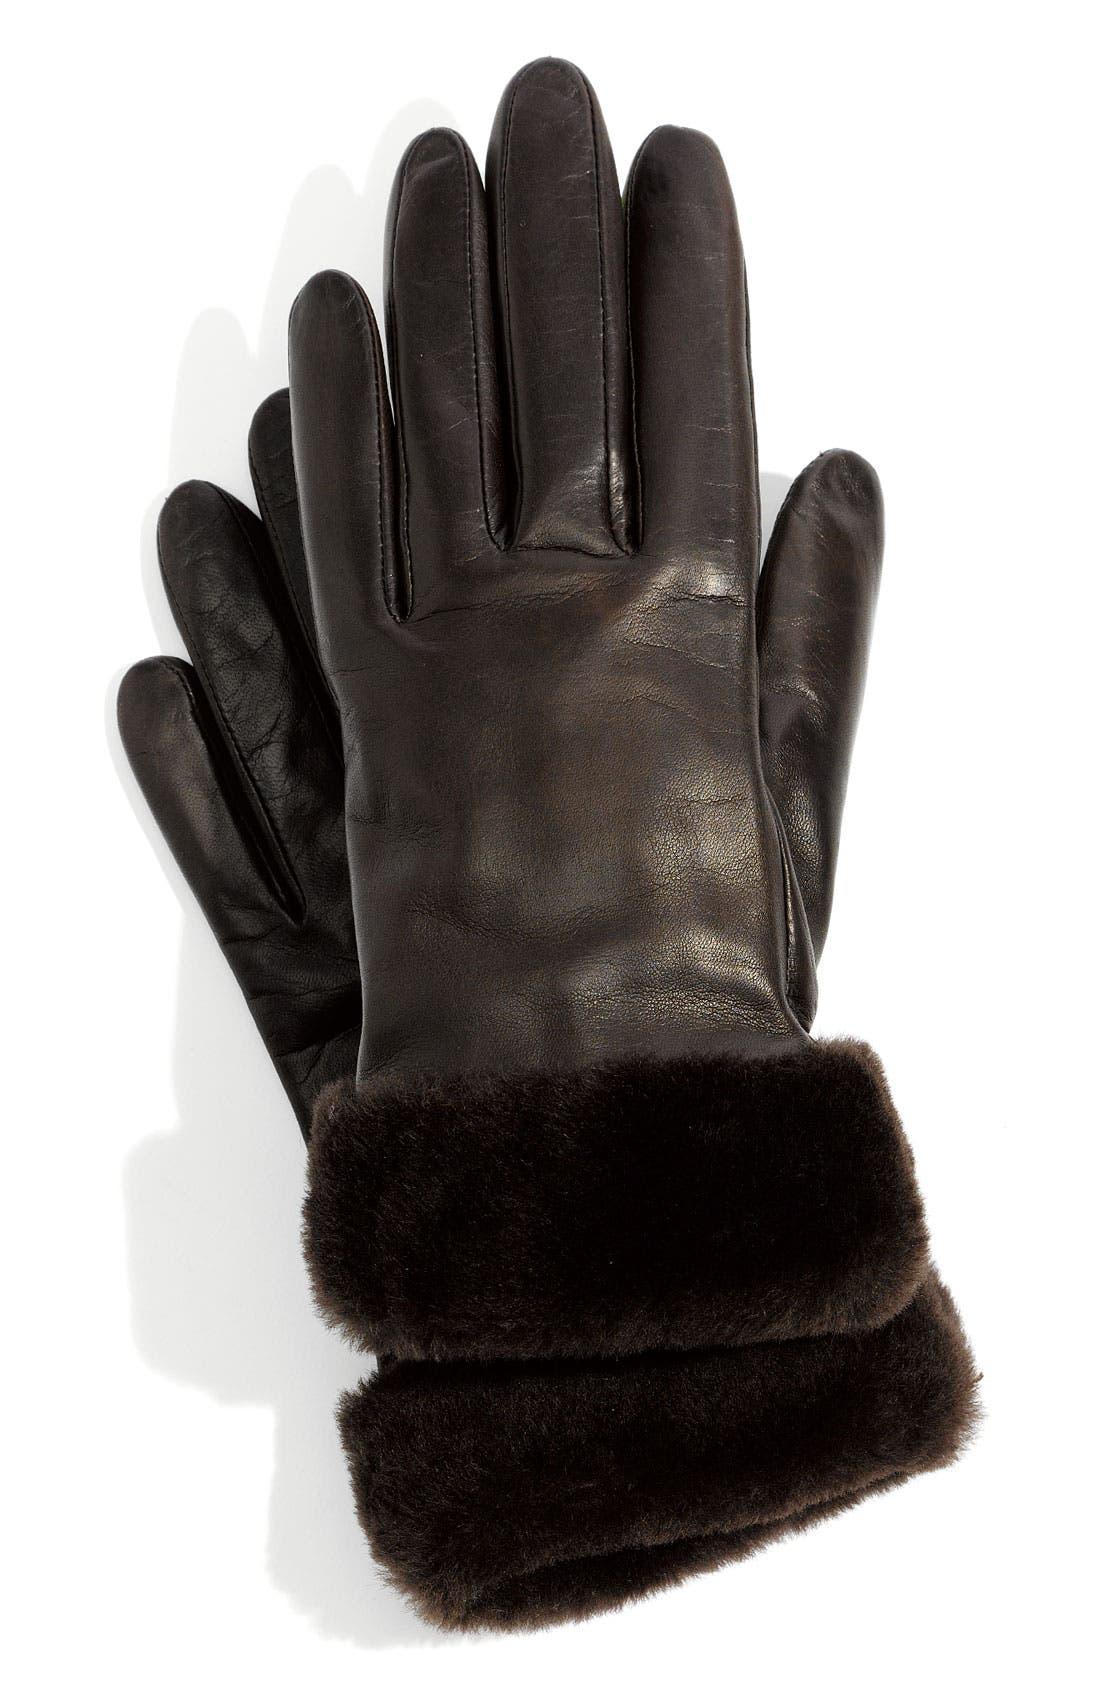 Main Image - UGG® Australia 'Fashion Shorty' Tech Glove